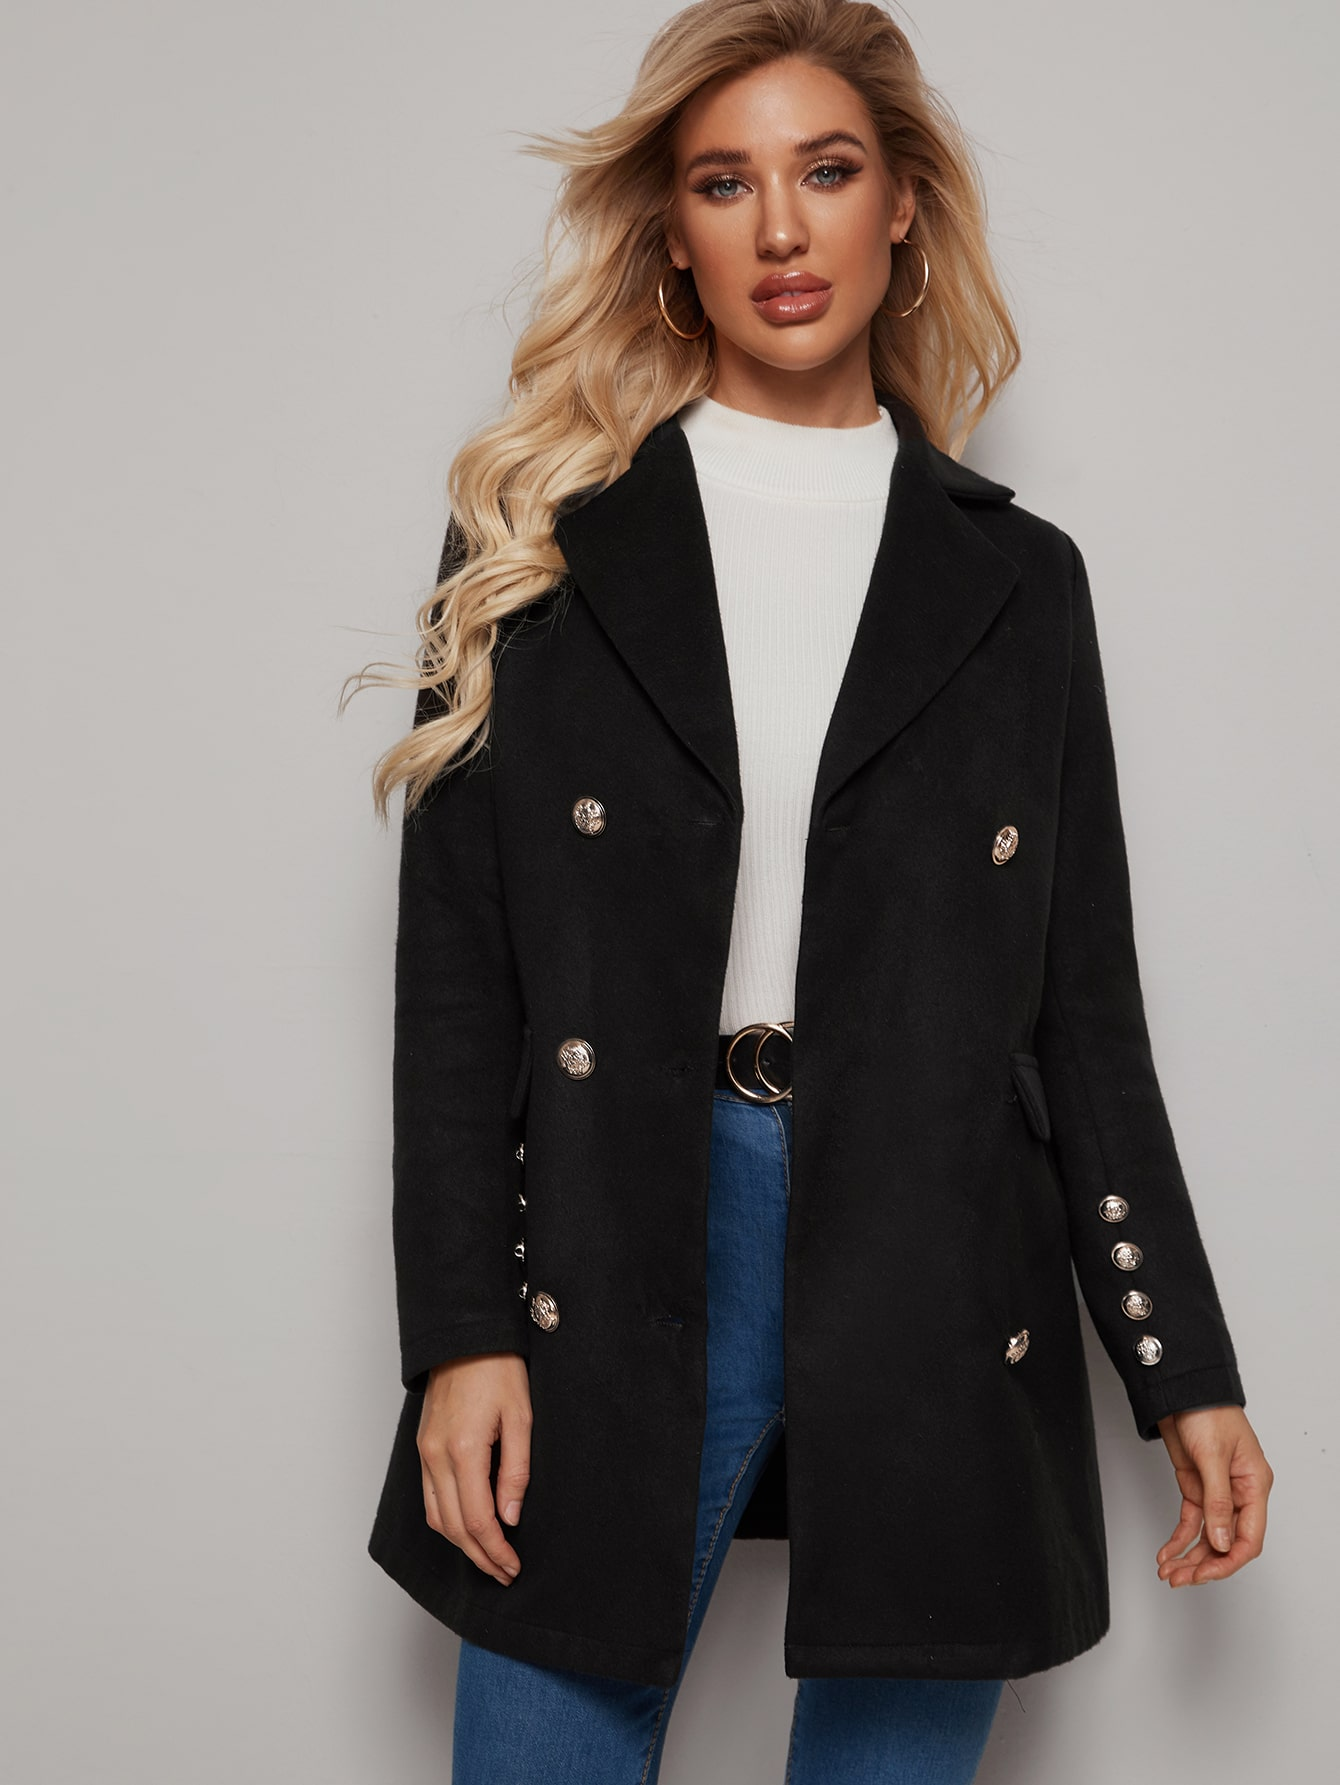 Collare Tacca Pea Coat